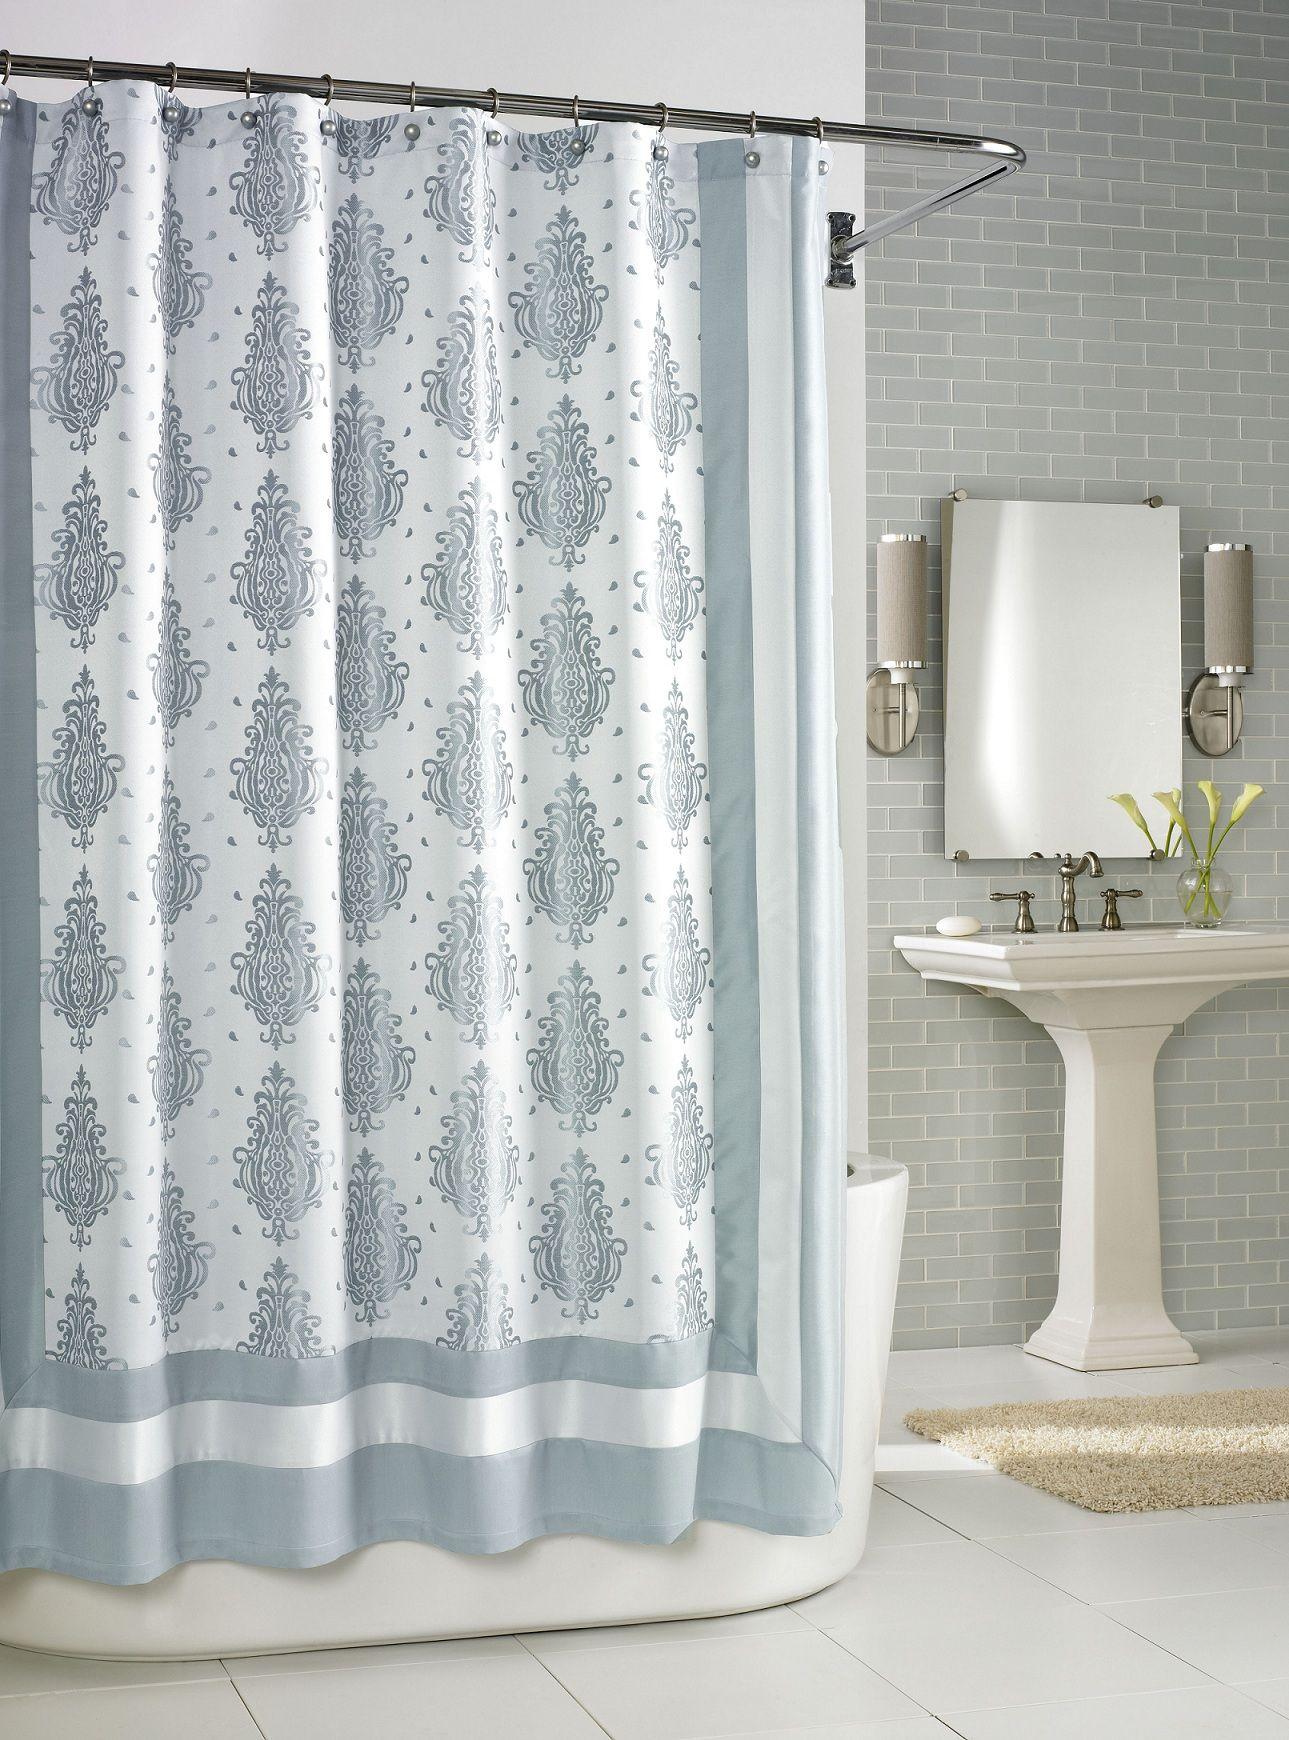 Roma Shower Curtain By Kassatex 83 99 Kassatex Shower Curtain